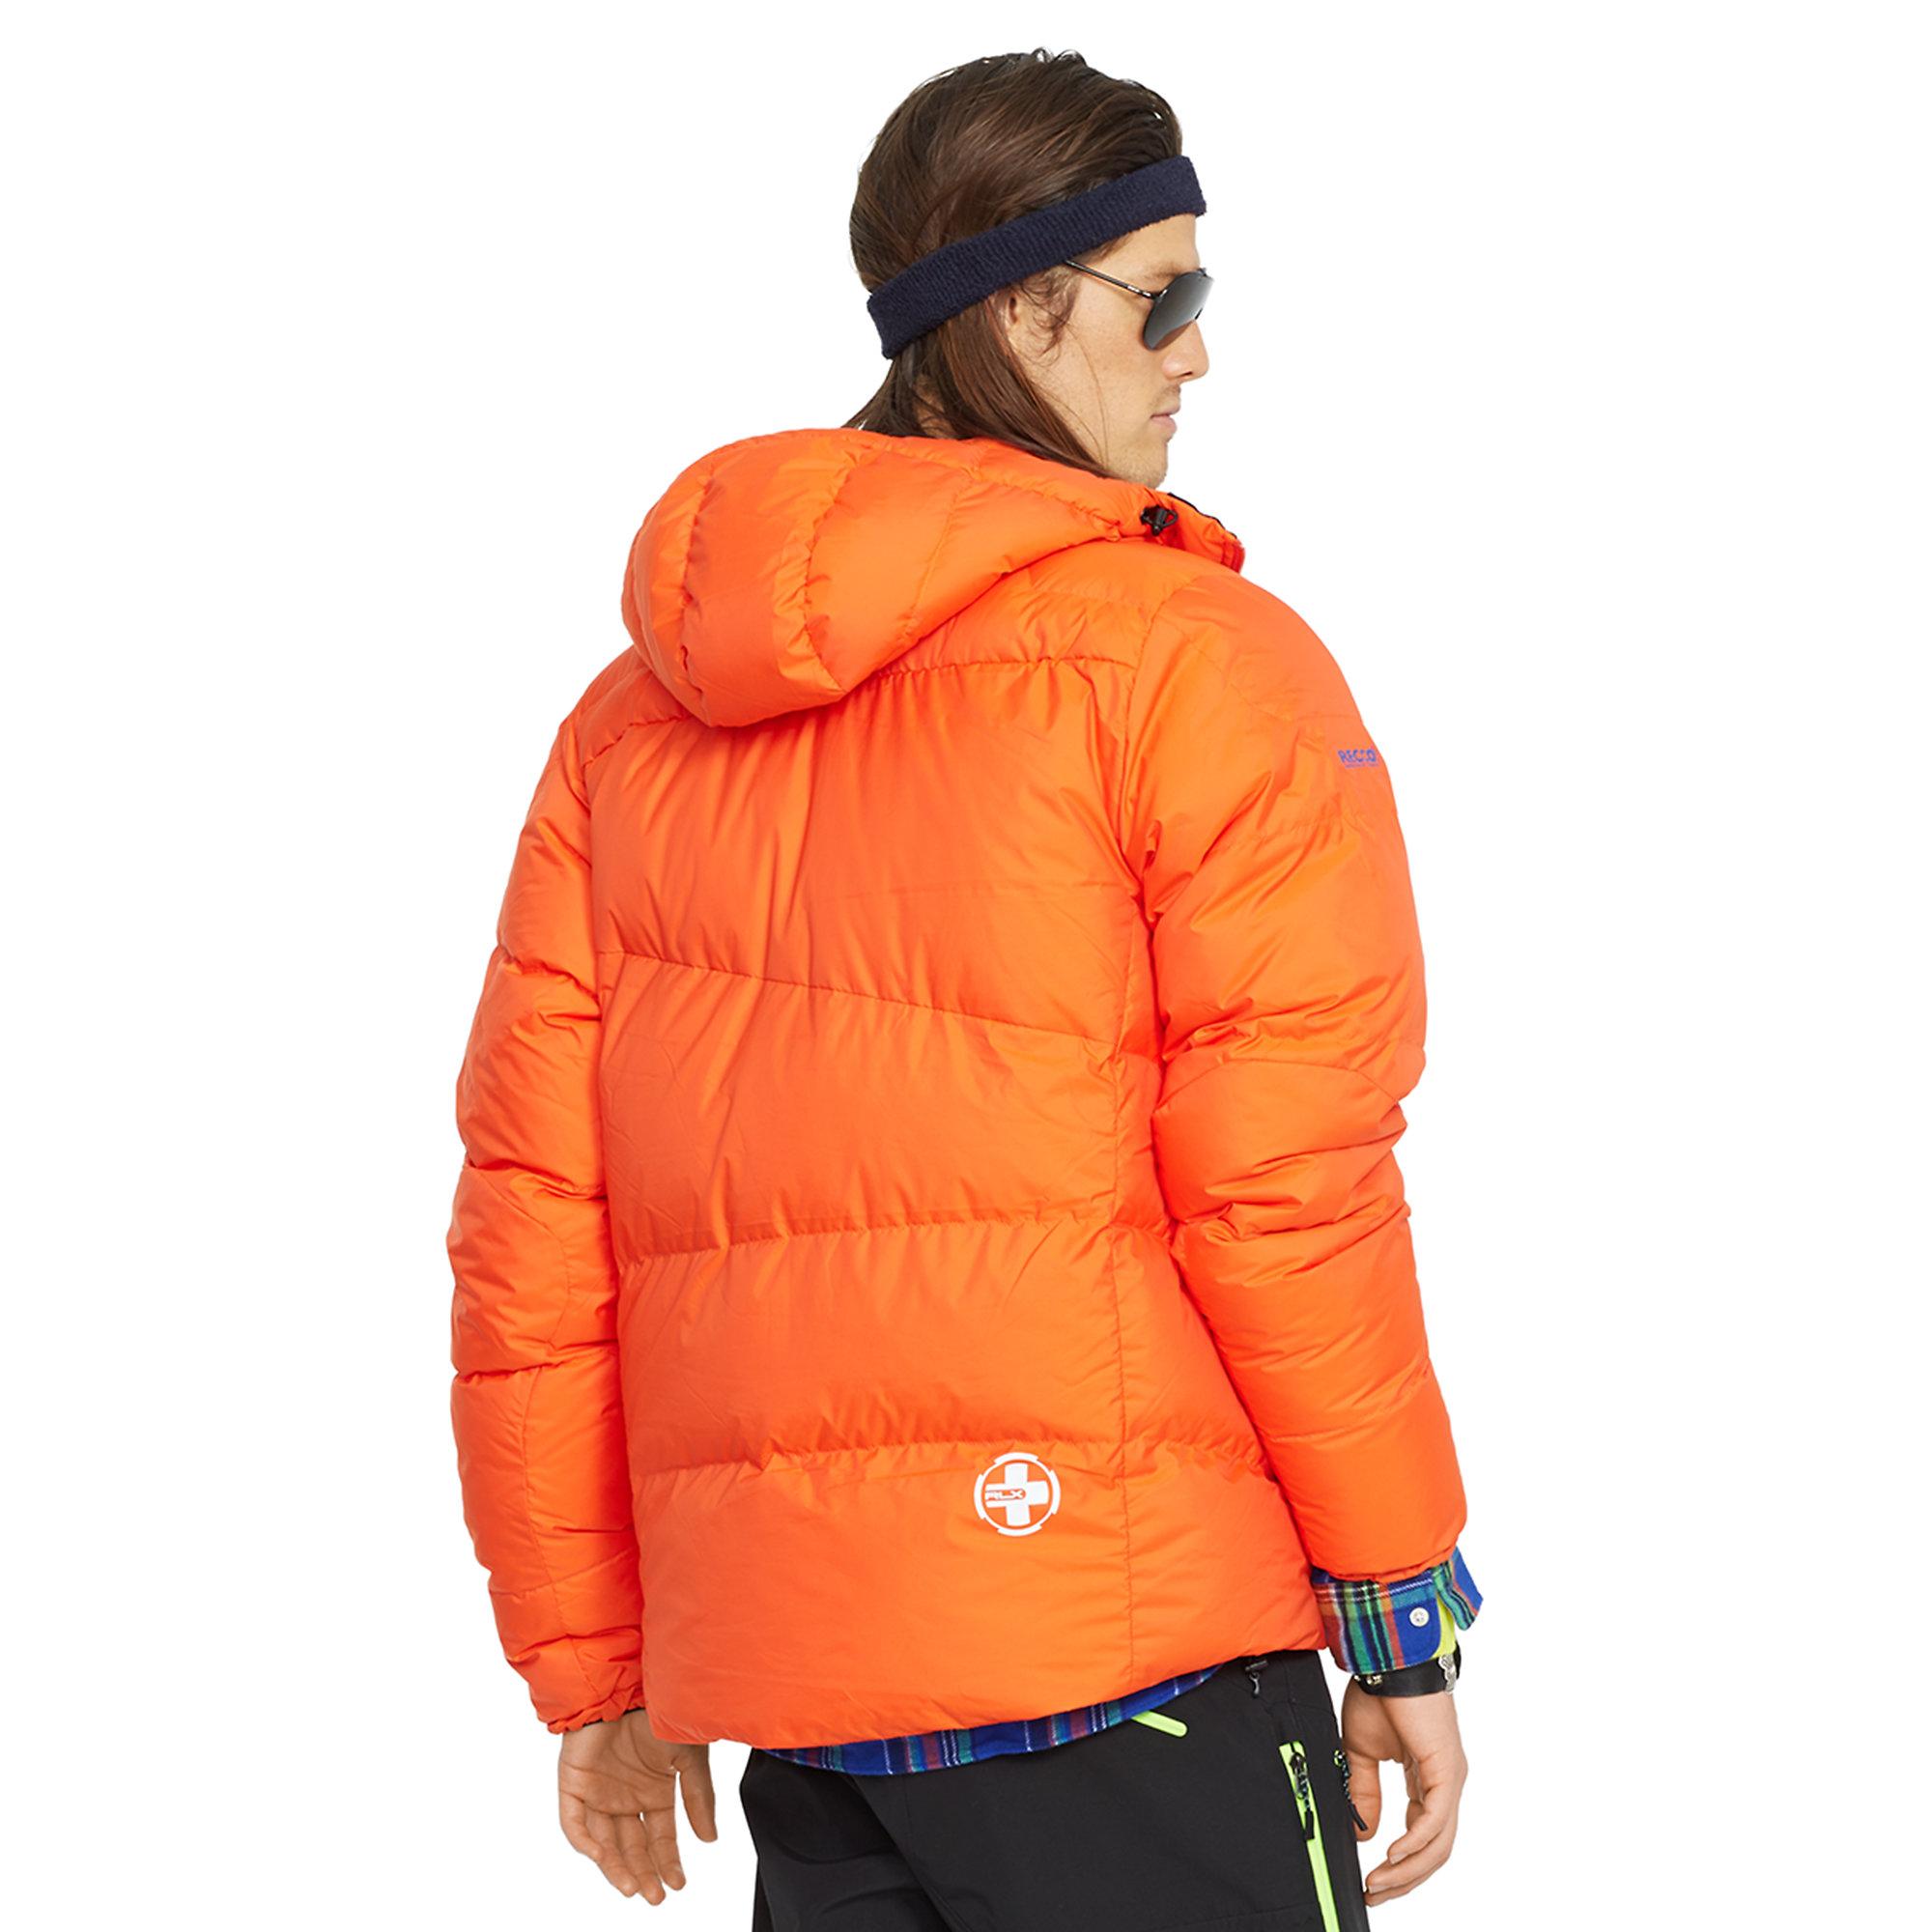 Ralph Lauren Hooded Down Ski Jacket In Orange For Men